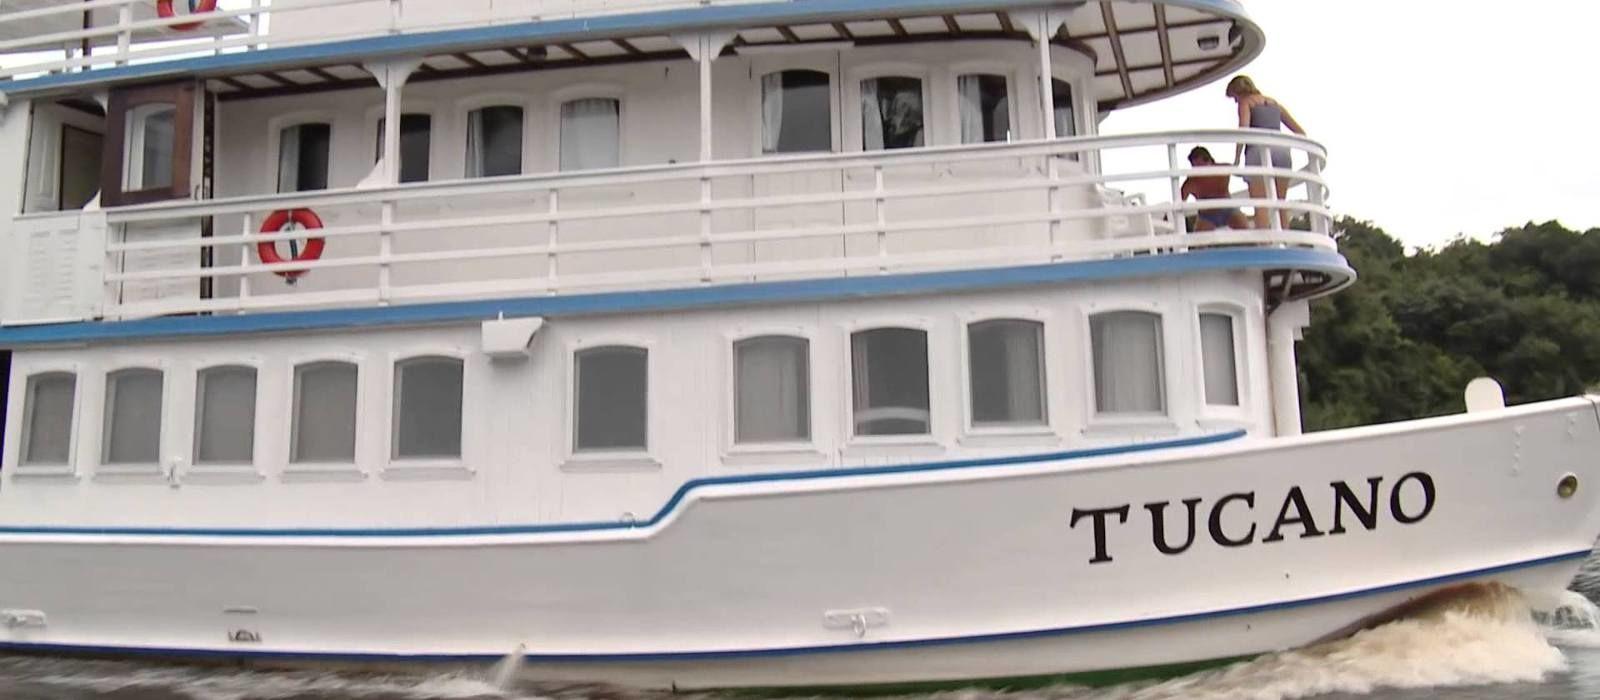 Hotel Motor Yacht Tucano %region%